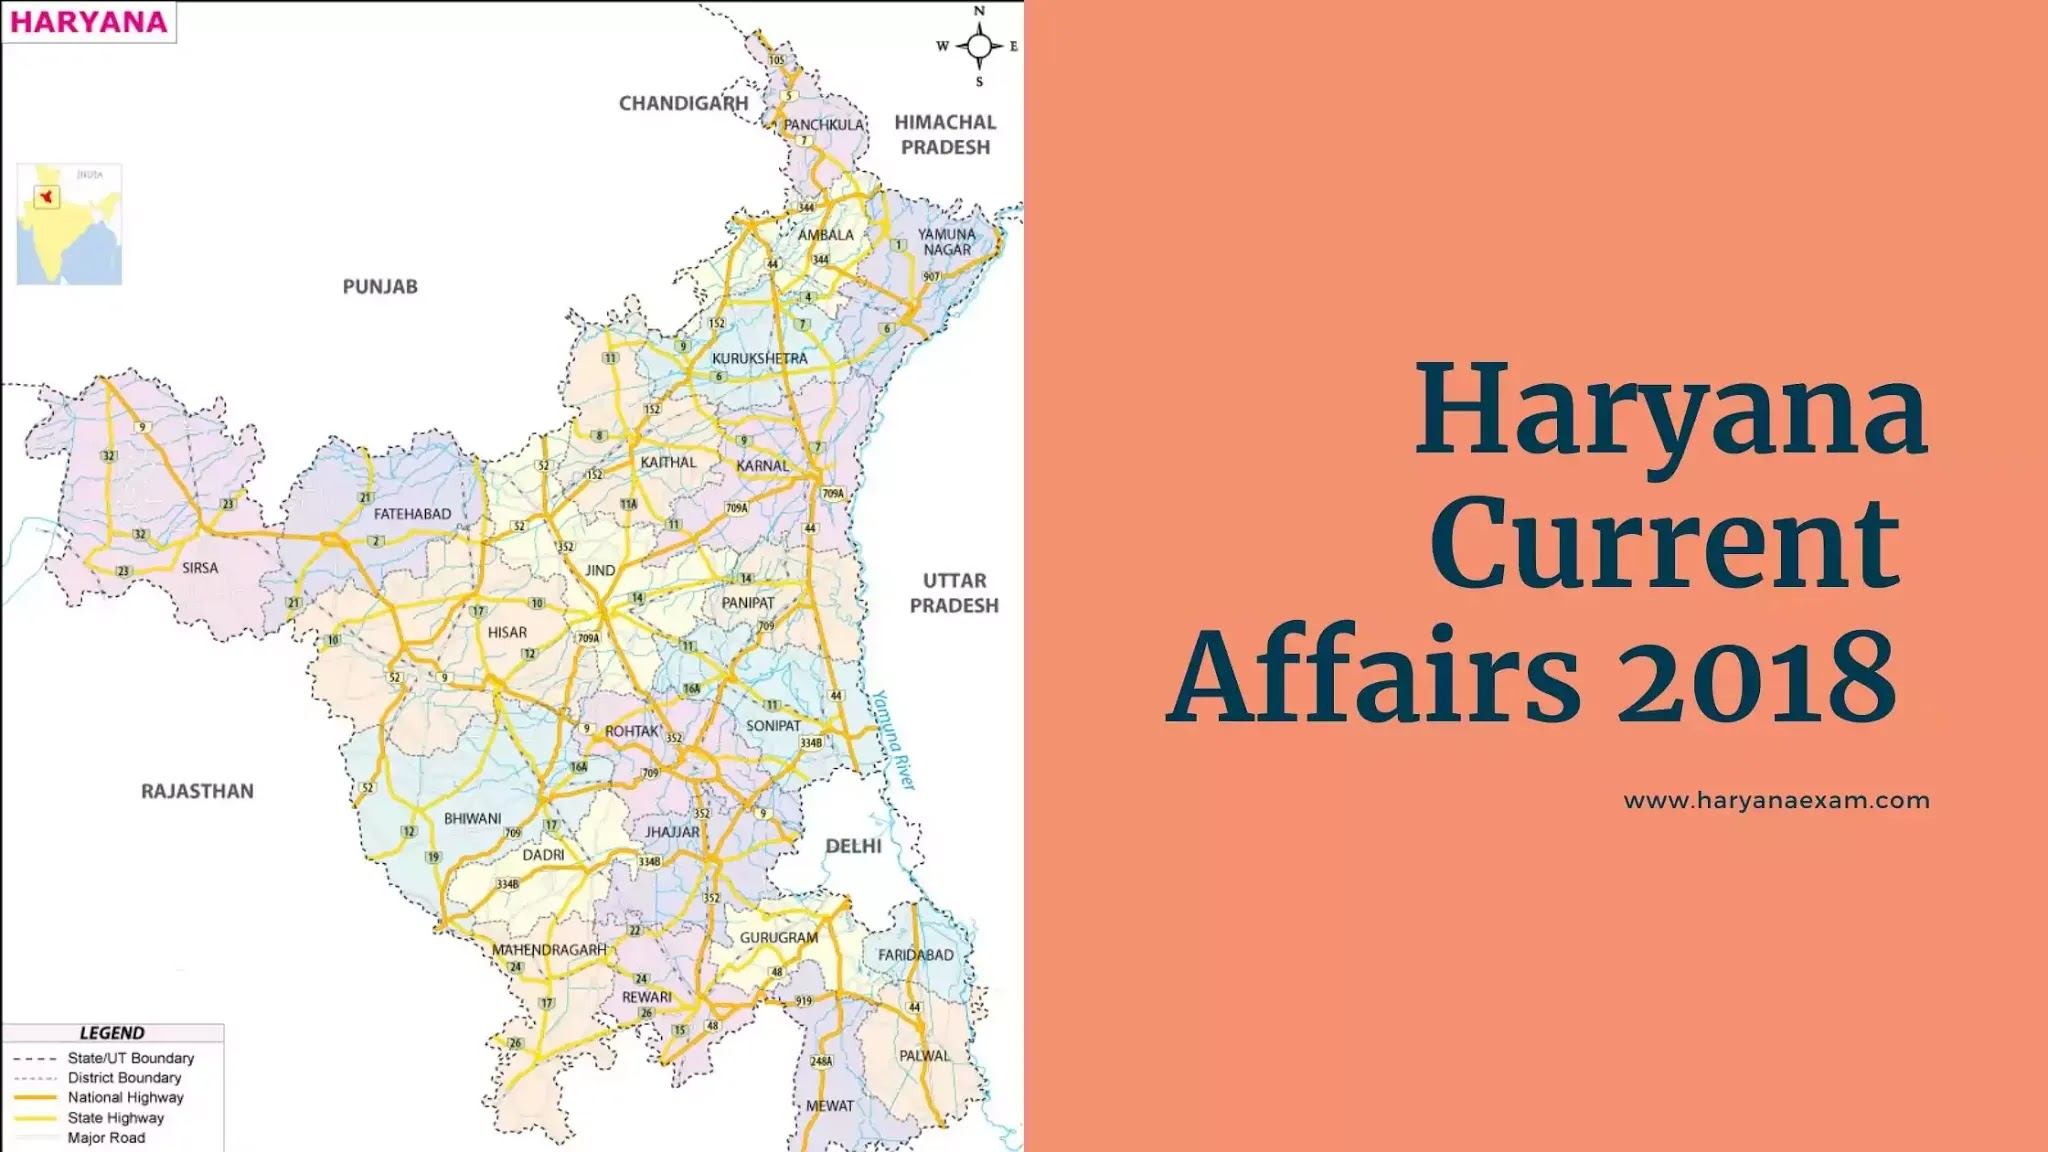 Haryana Current Affairs 2018